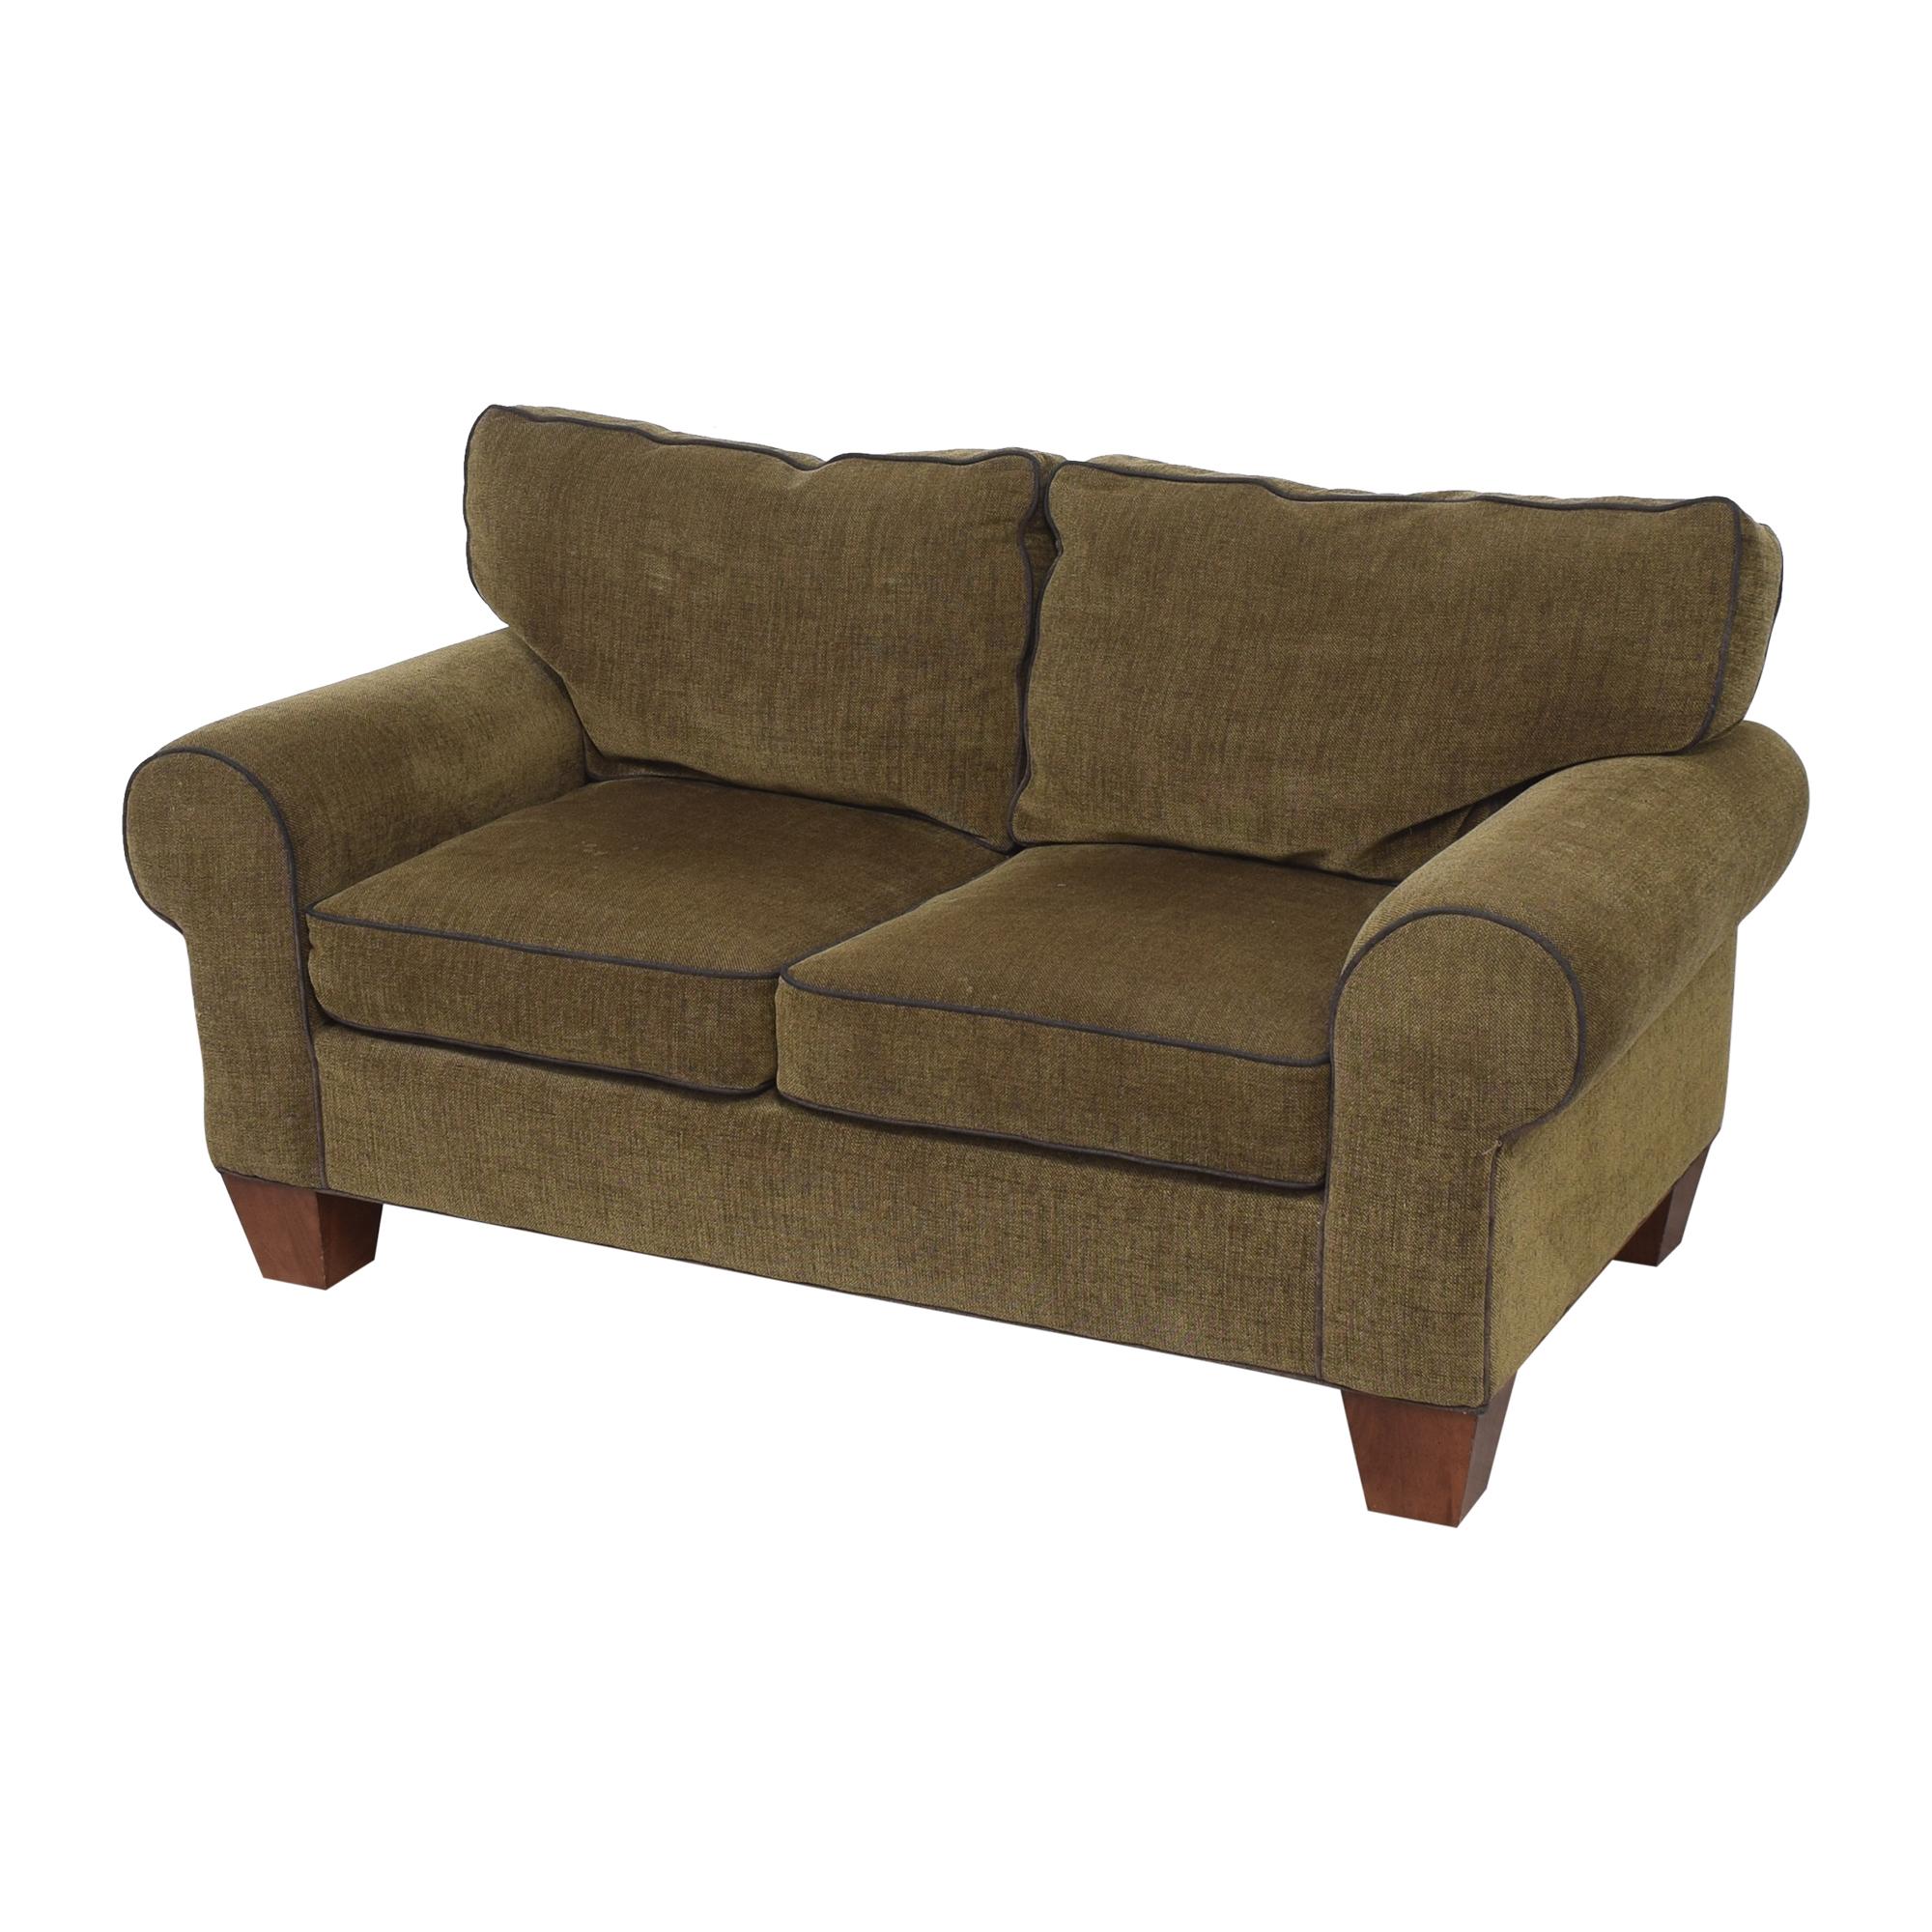 Norwalk Furniture Roll Arm Loveseat / Sofas